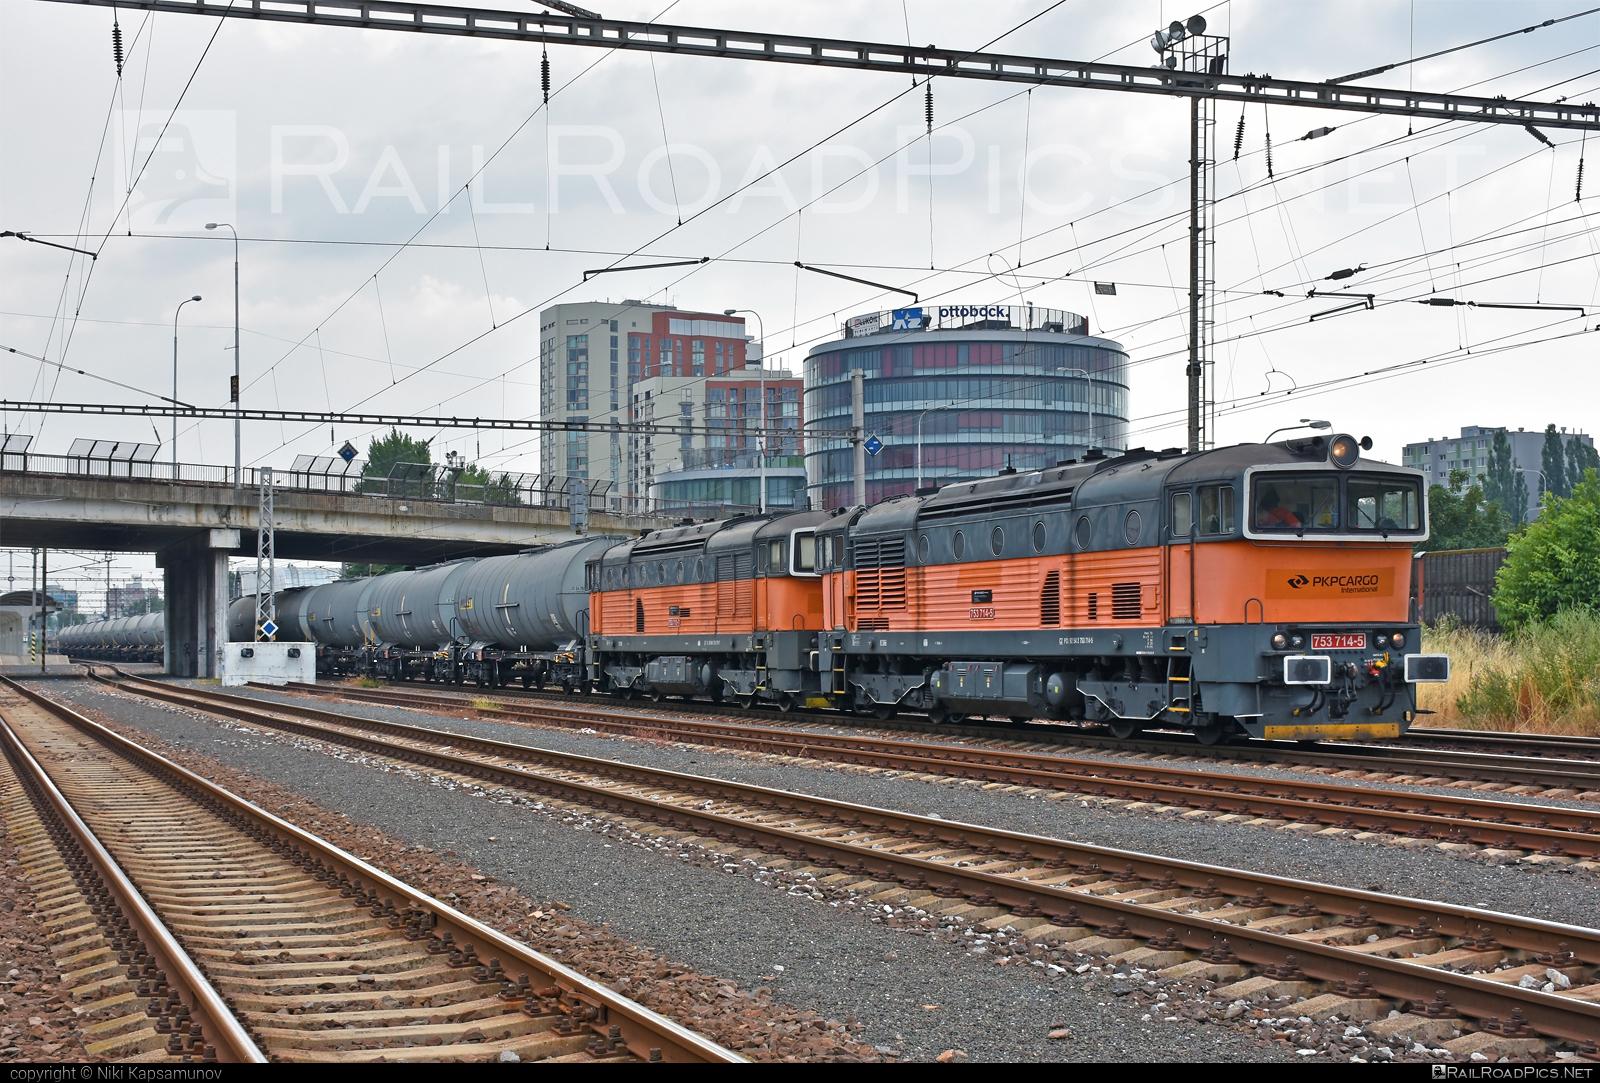 ČKD T 478.3 (753) - 753 714-5 operated by PKP CARGO INTERNATIONAL a.s. #brejlovec #ckd #ckdclass753 #ckdt4783 #locomotive753 #okuliarnik #pkpcargointernational #pkpcargointernationalas